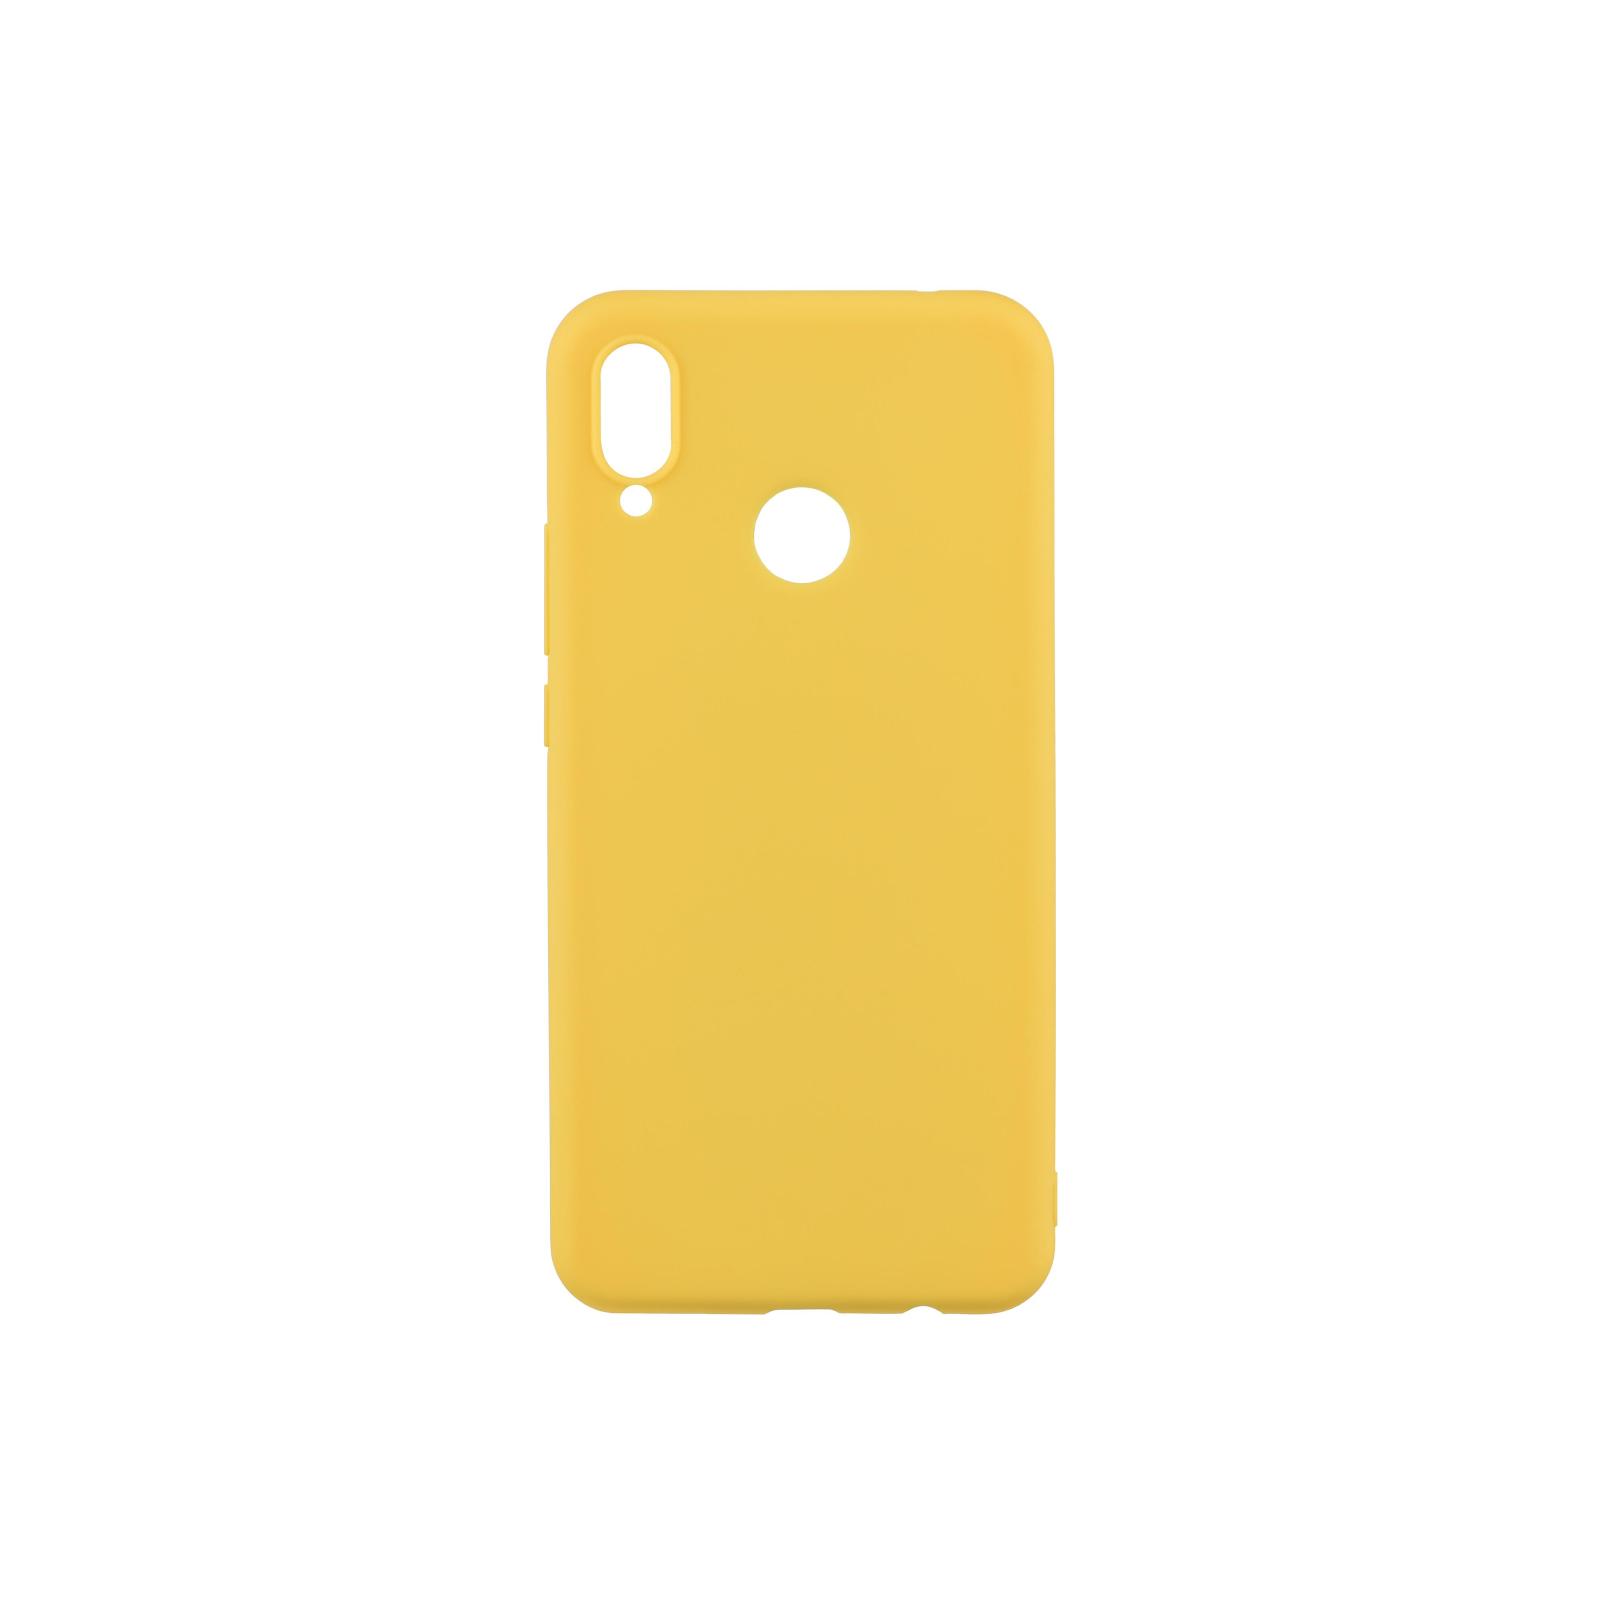 Чехол для моб. телефона 2E Huawei Y6 2018, Soft touch, Mustard (2E-H-Y6-18-NKST-MS)